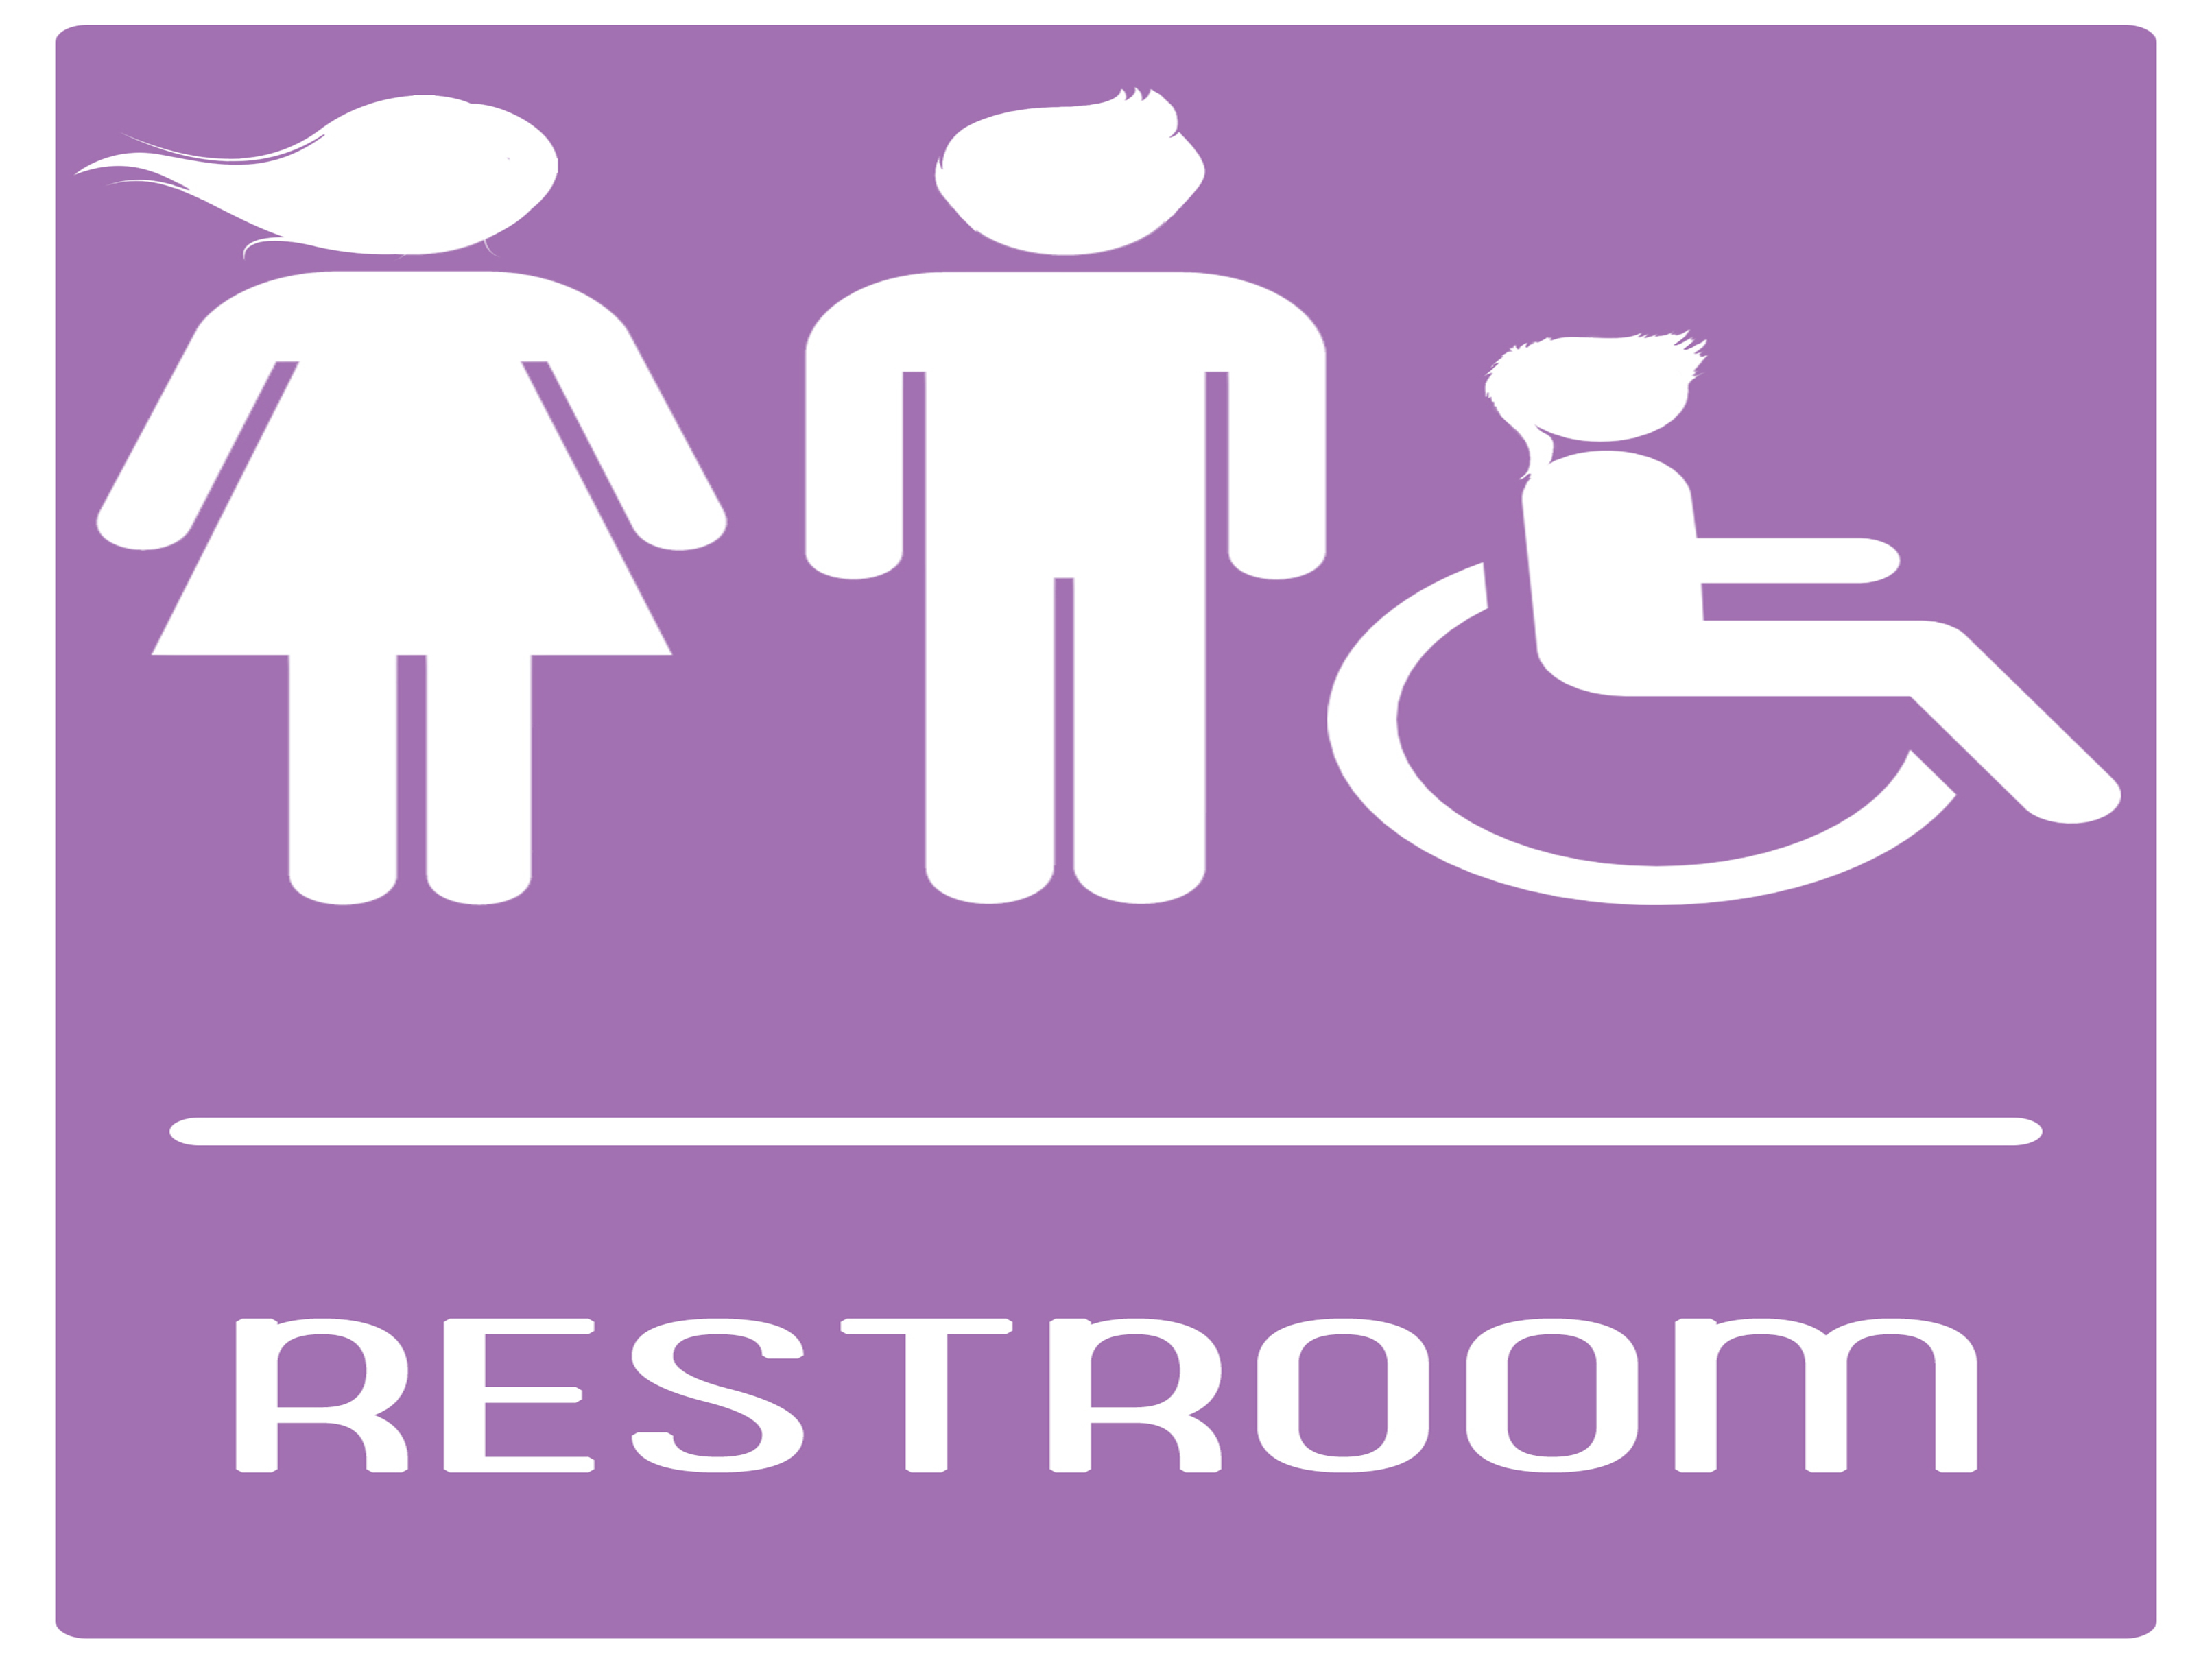 restroom-new1 copy